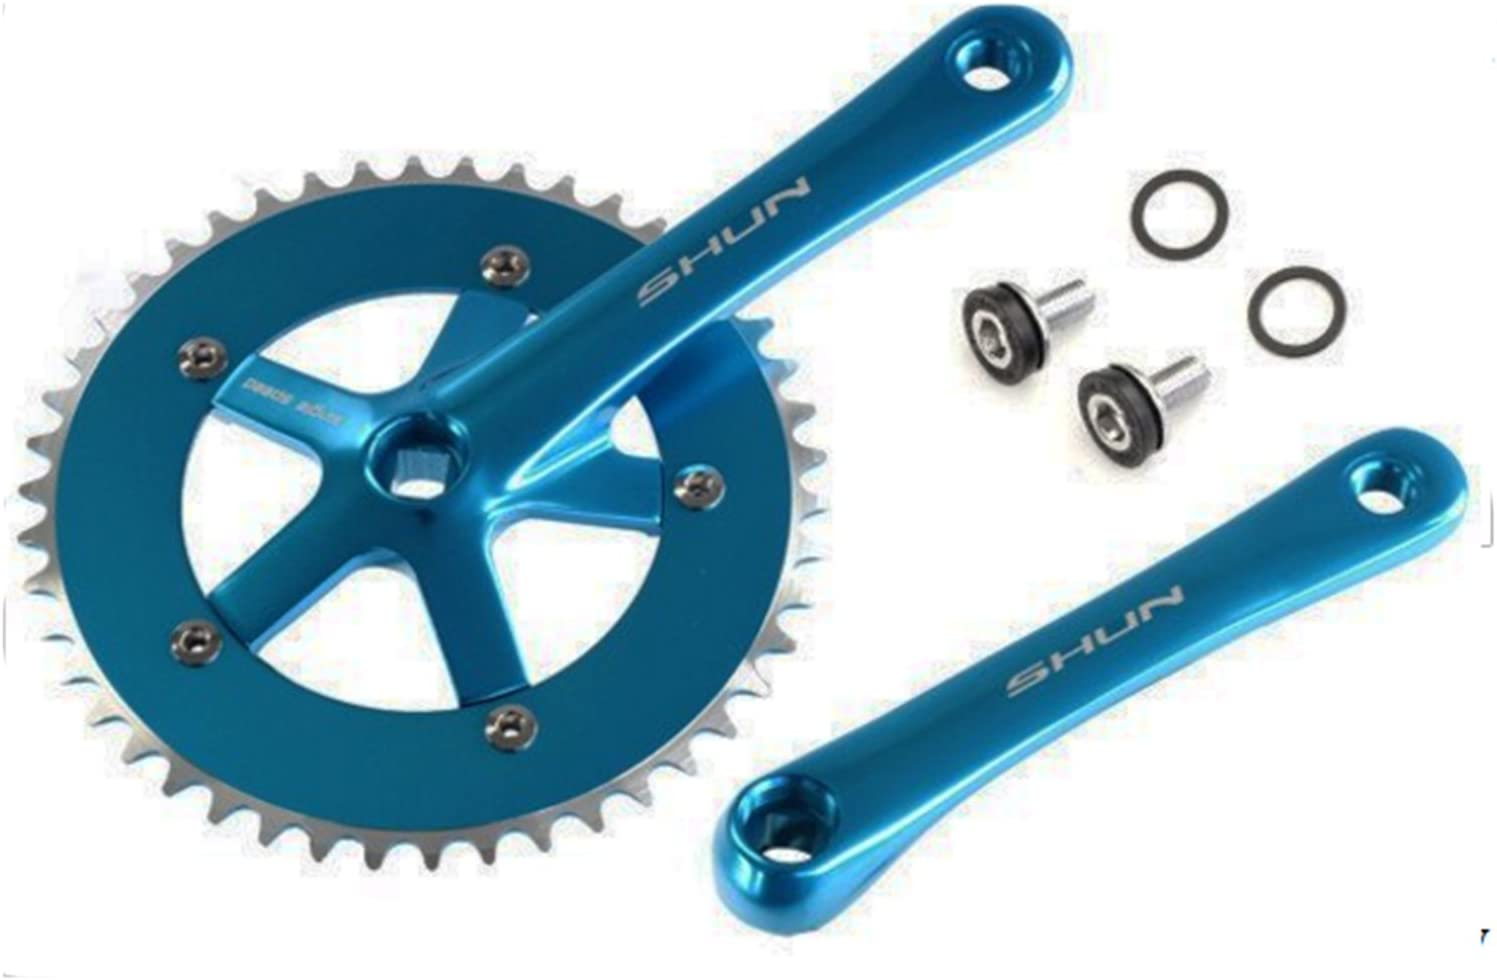 Plato y Bielas BLANCO Aluminio CNC Bicicleta Fixie Singlespeed 165 x 46 T 3742